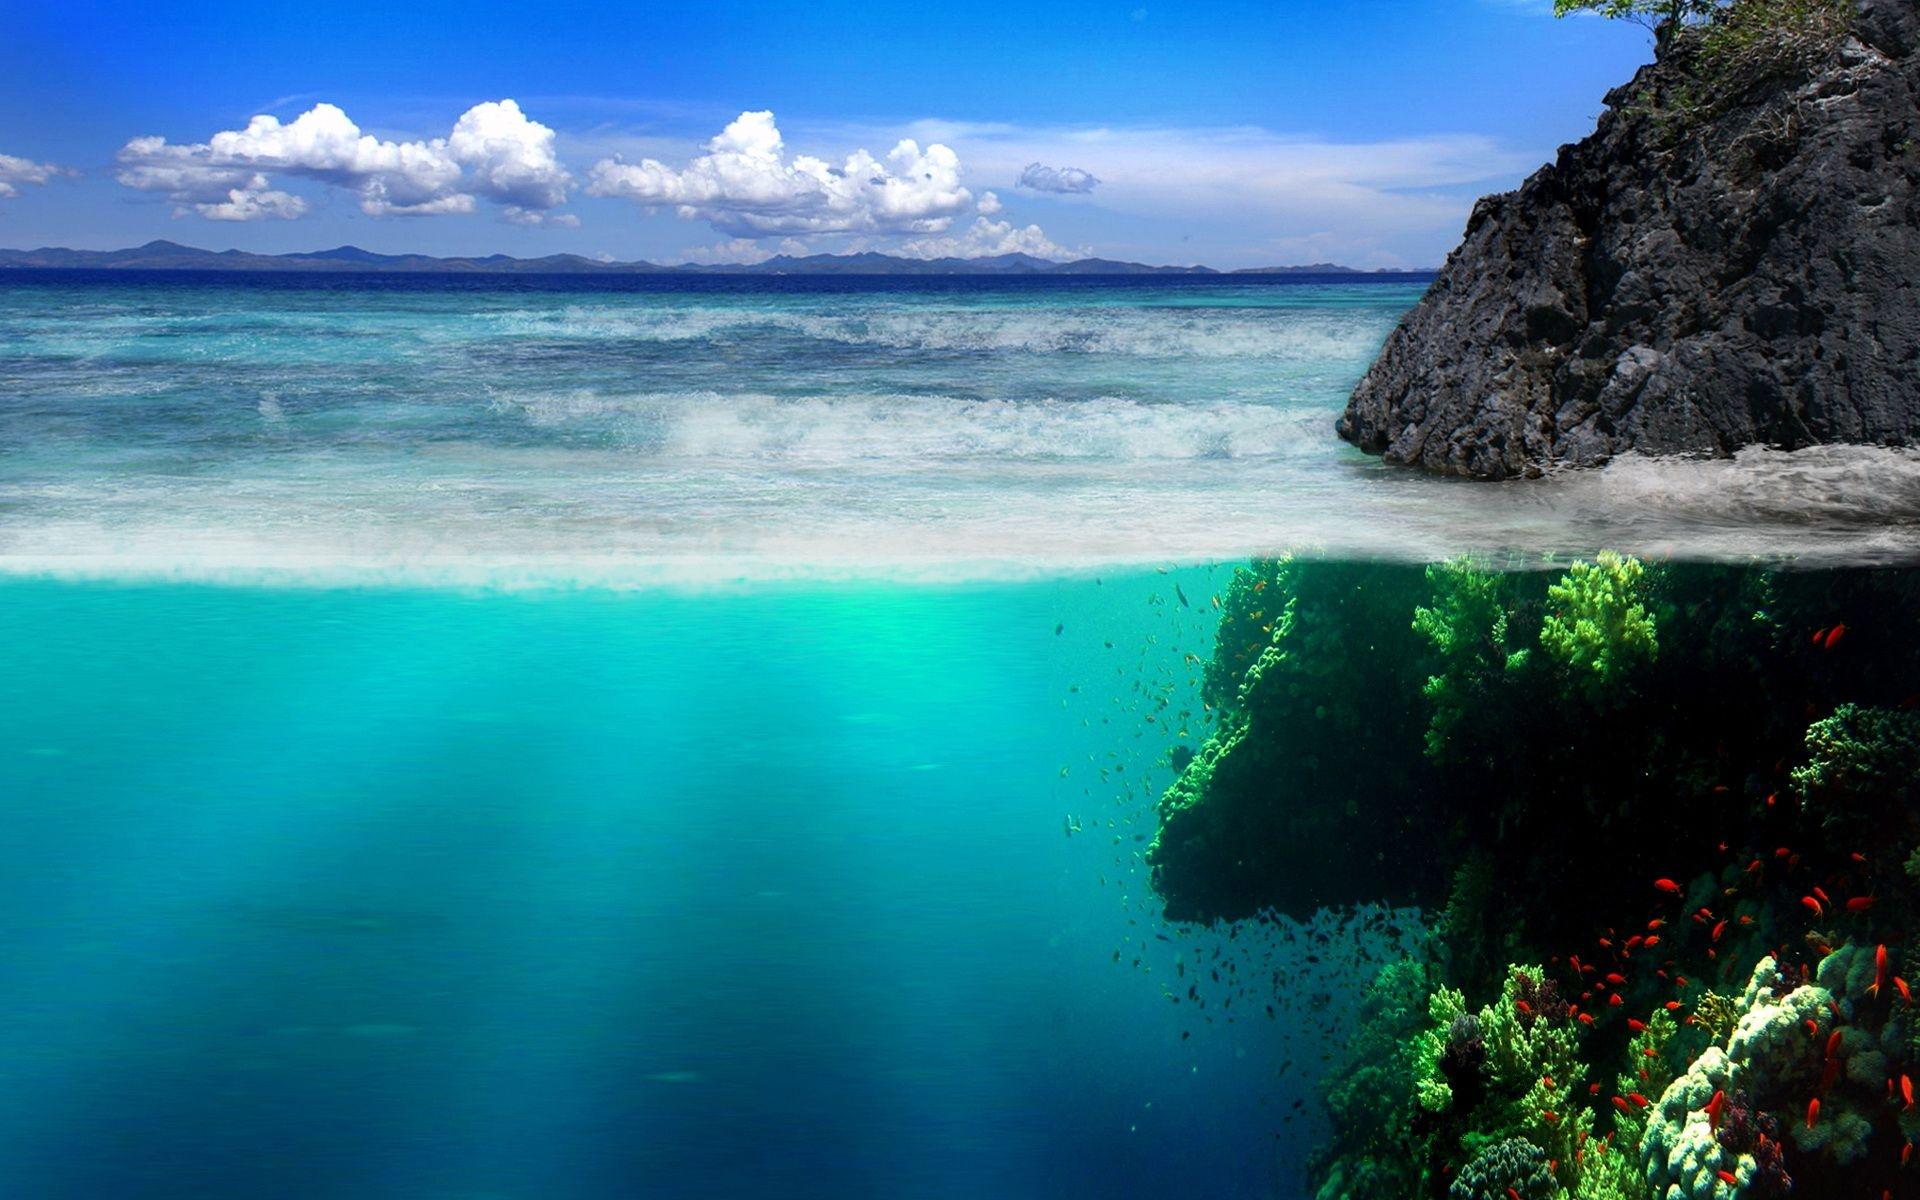 Ocean Landscape Wallpapers